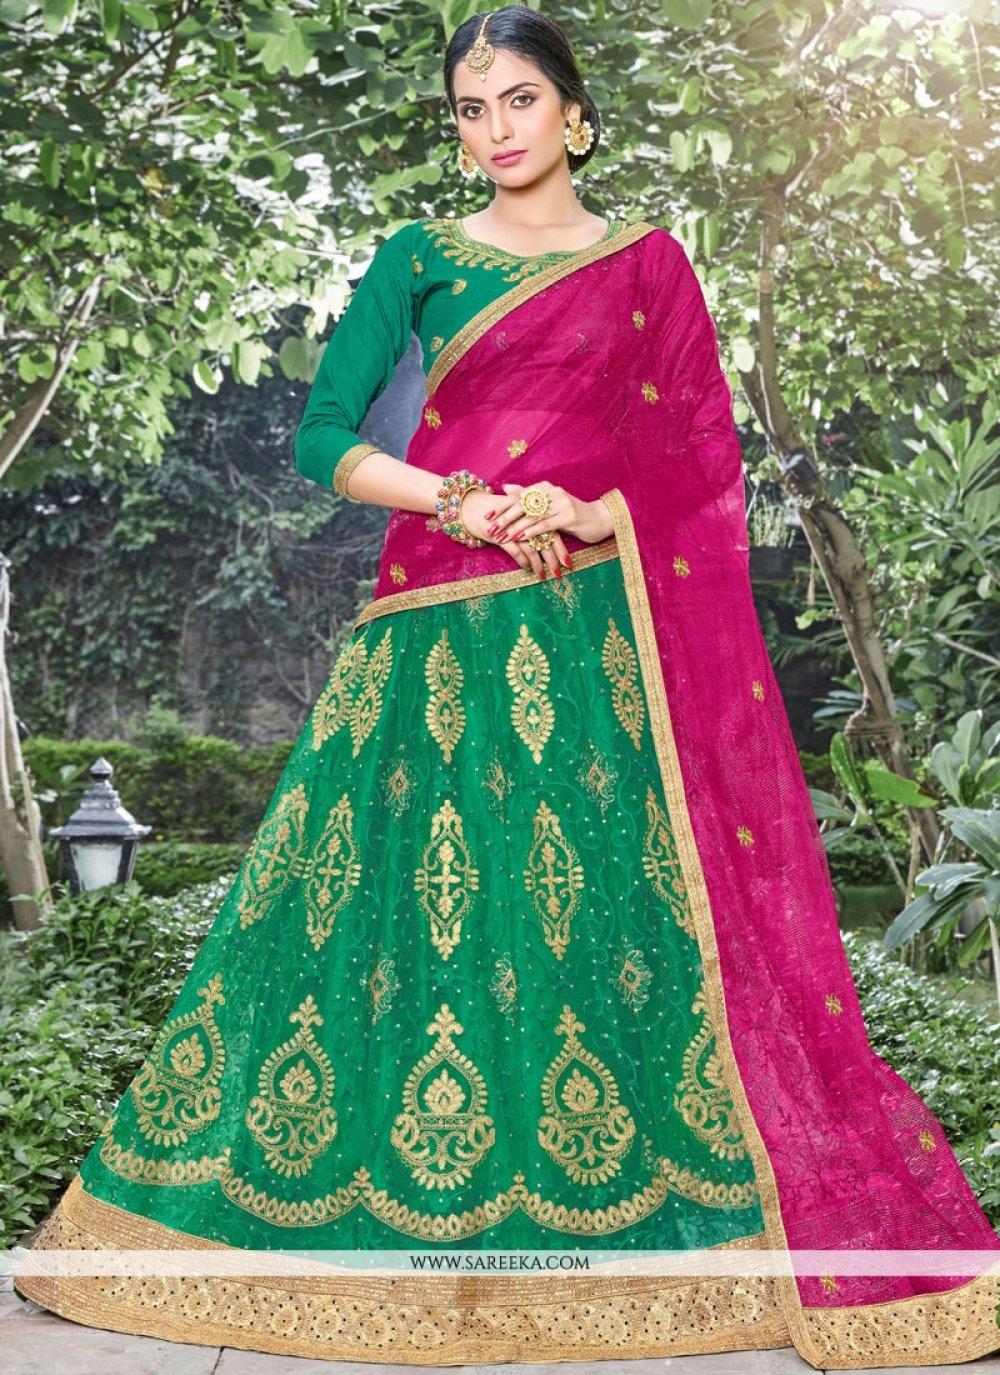 Lace Net Lehenga Choli in Green